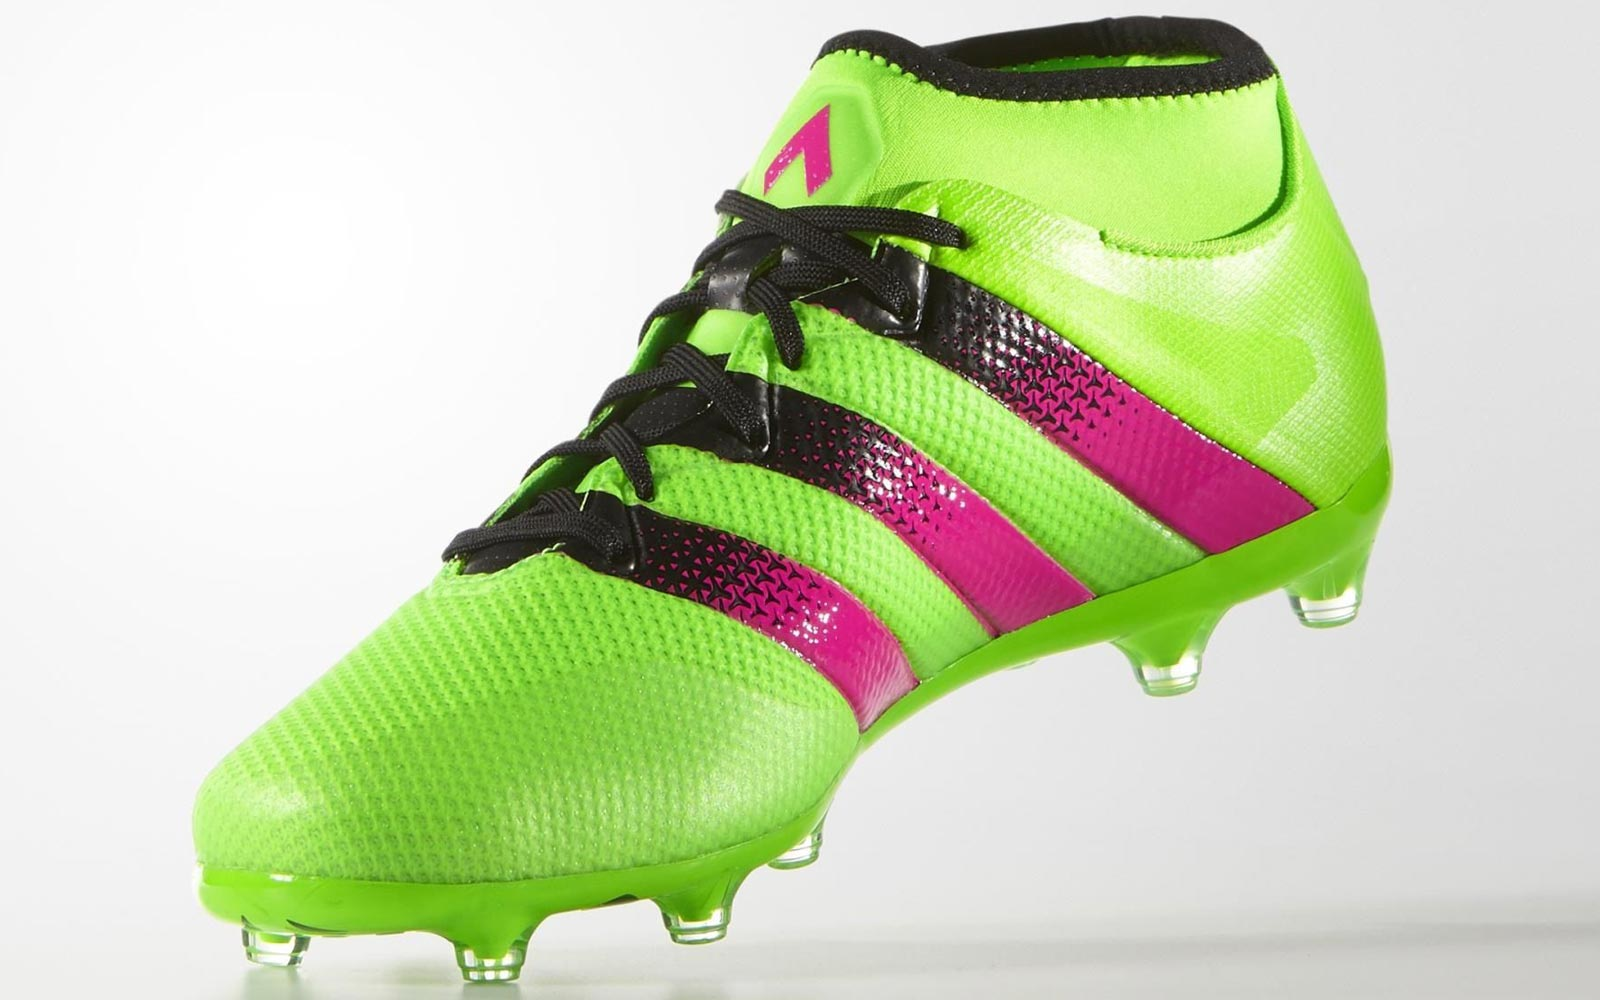 promo code a86d2 f2f47 adidas boots new